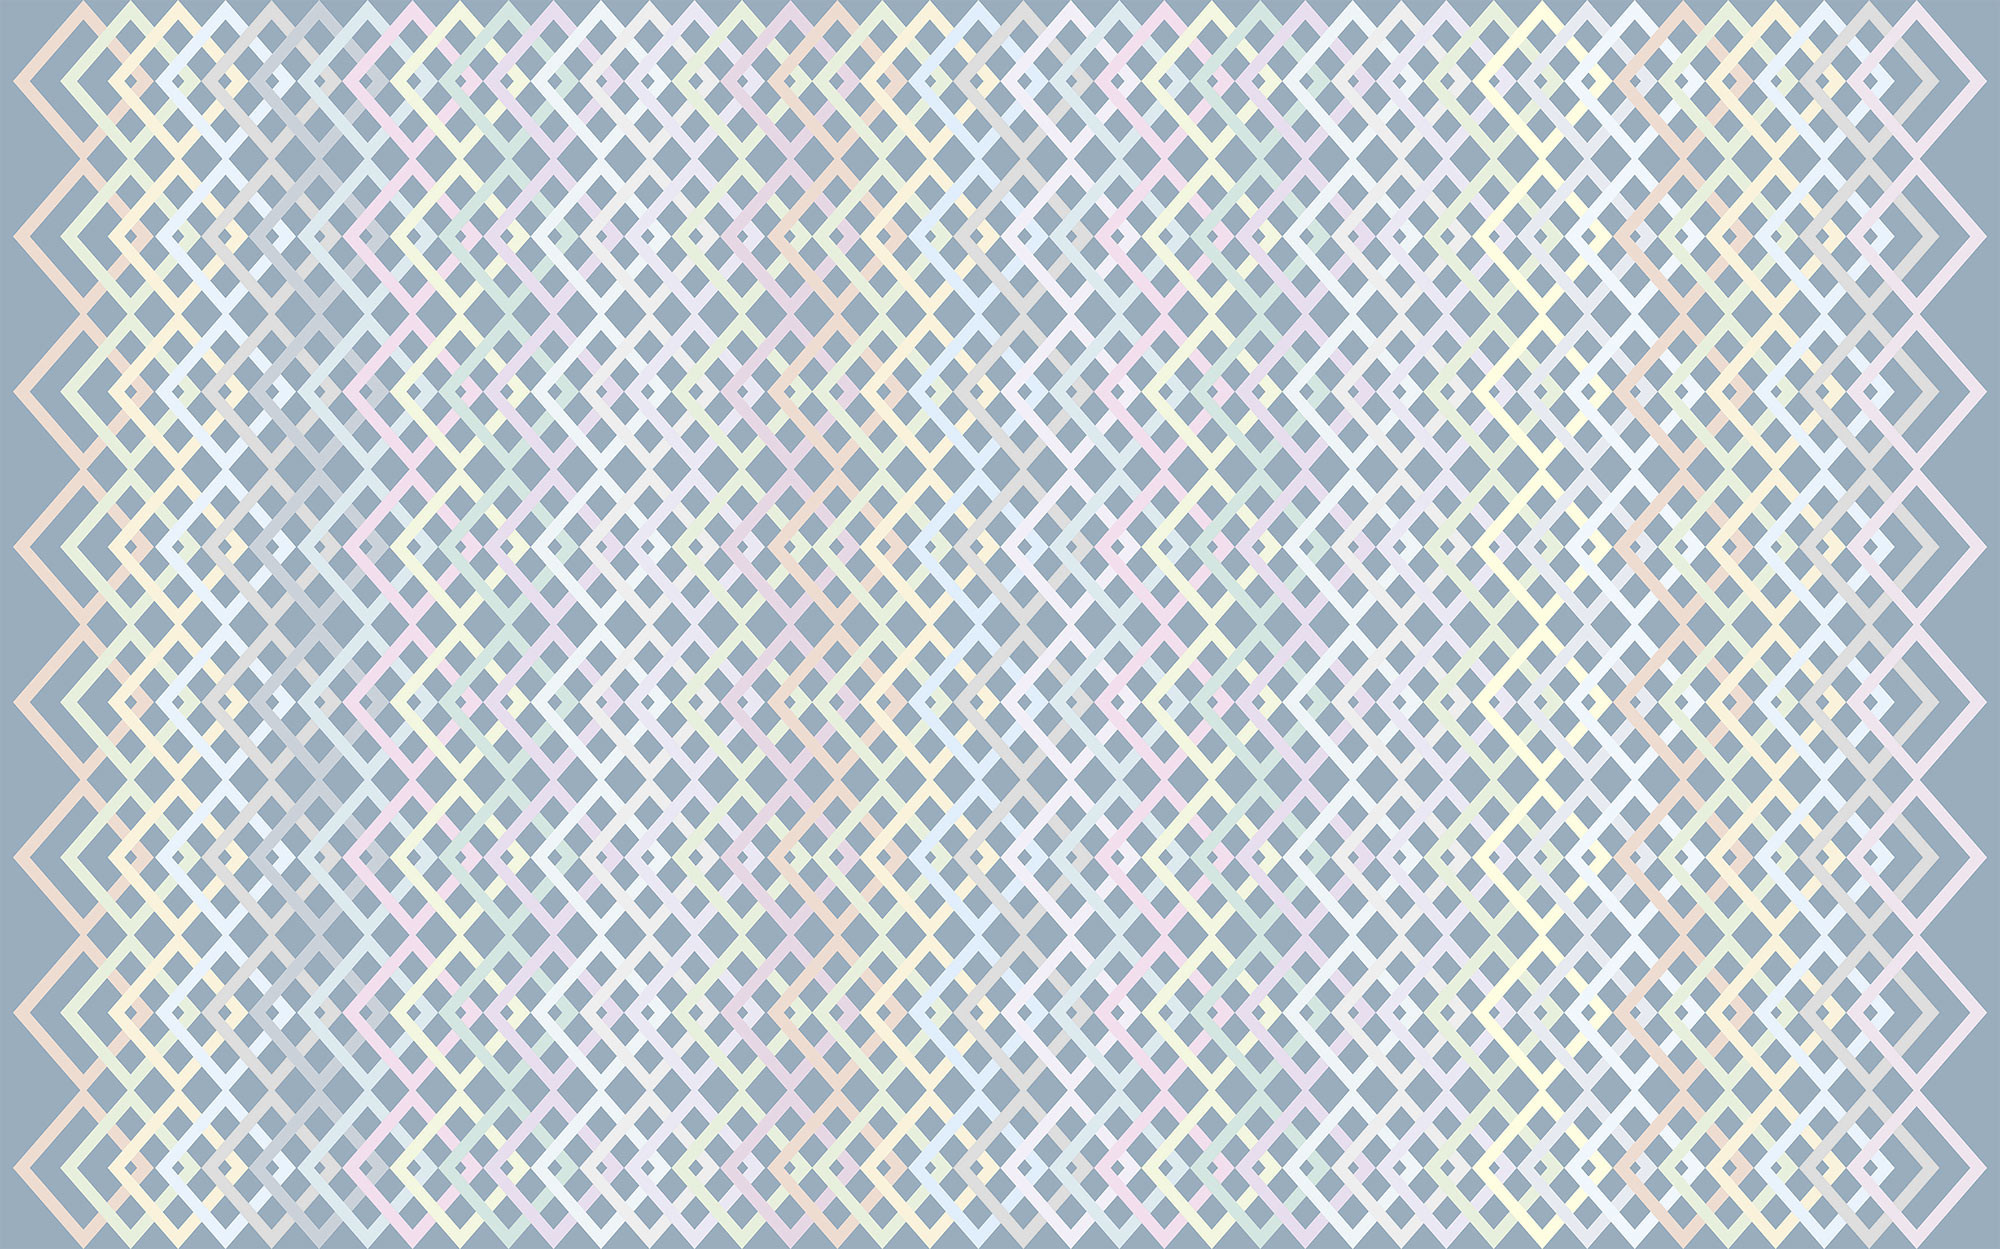 Structure Rhombus bleu-pastell